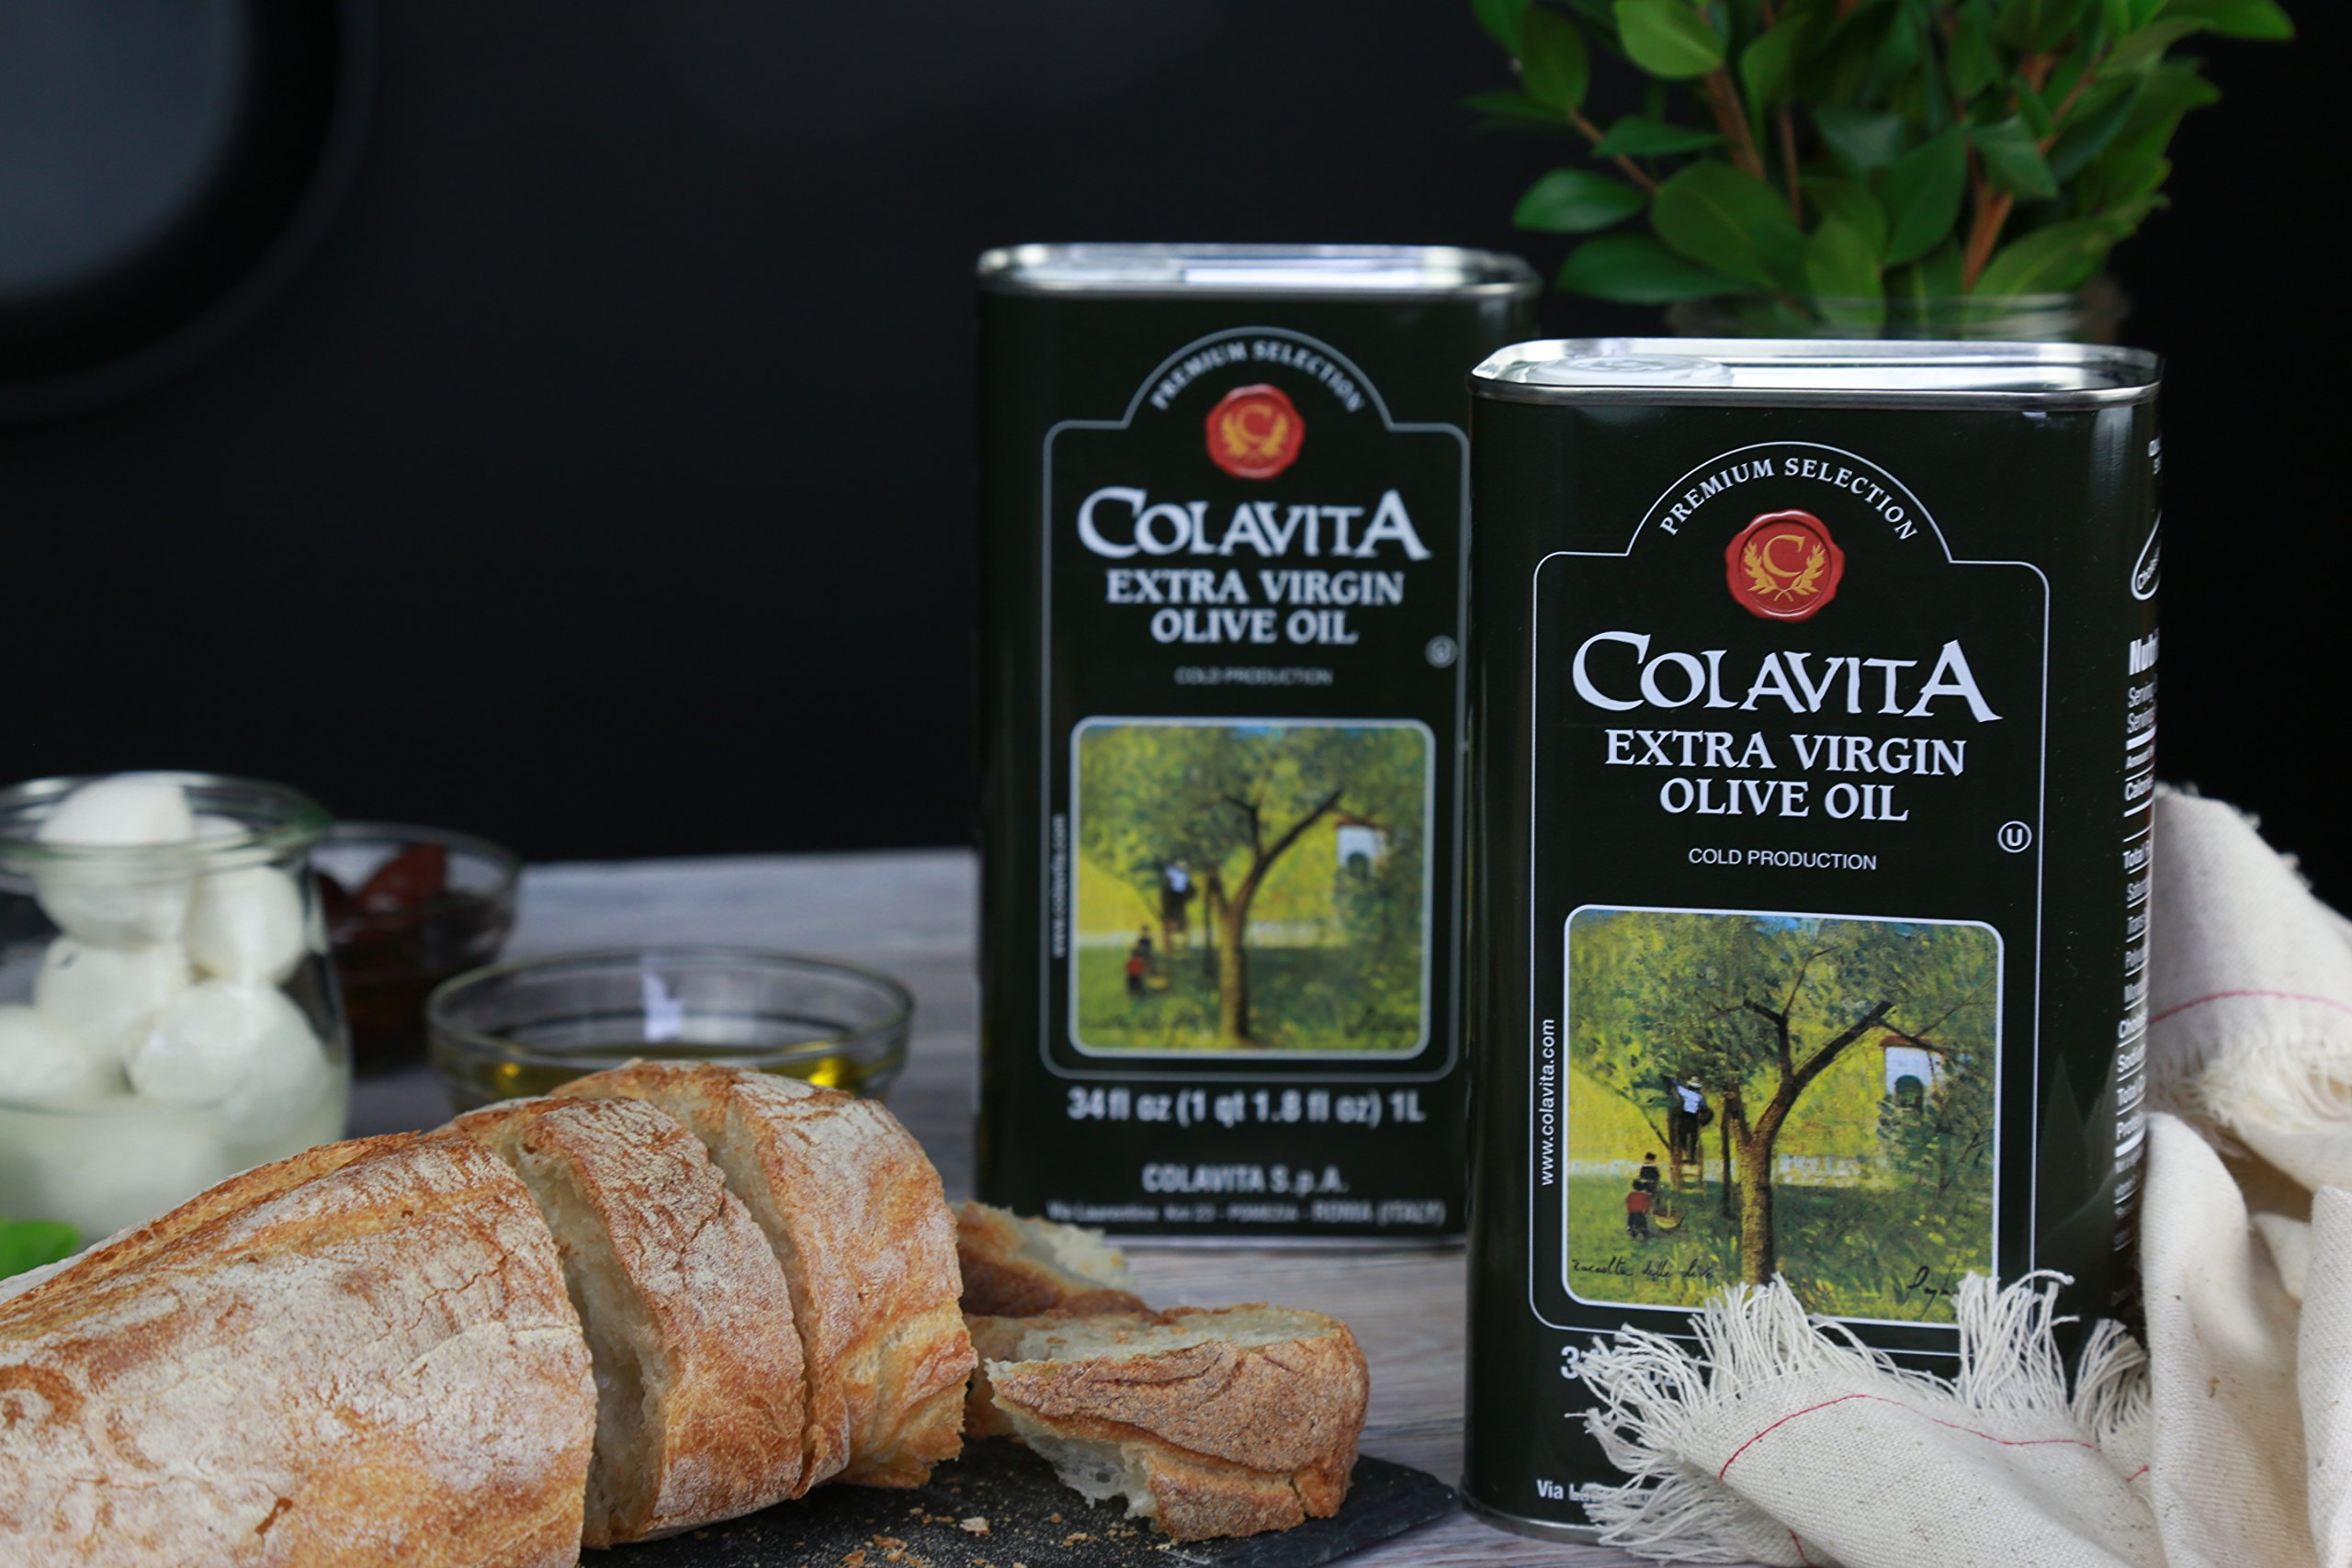 Colavita Extra Virgin Olive Oil, 34 oz Tins (Pack of 2) by Colavita (Image #8)